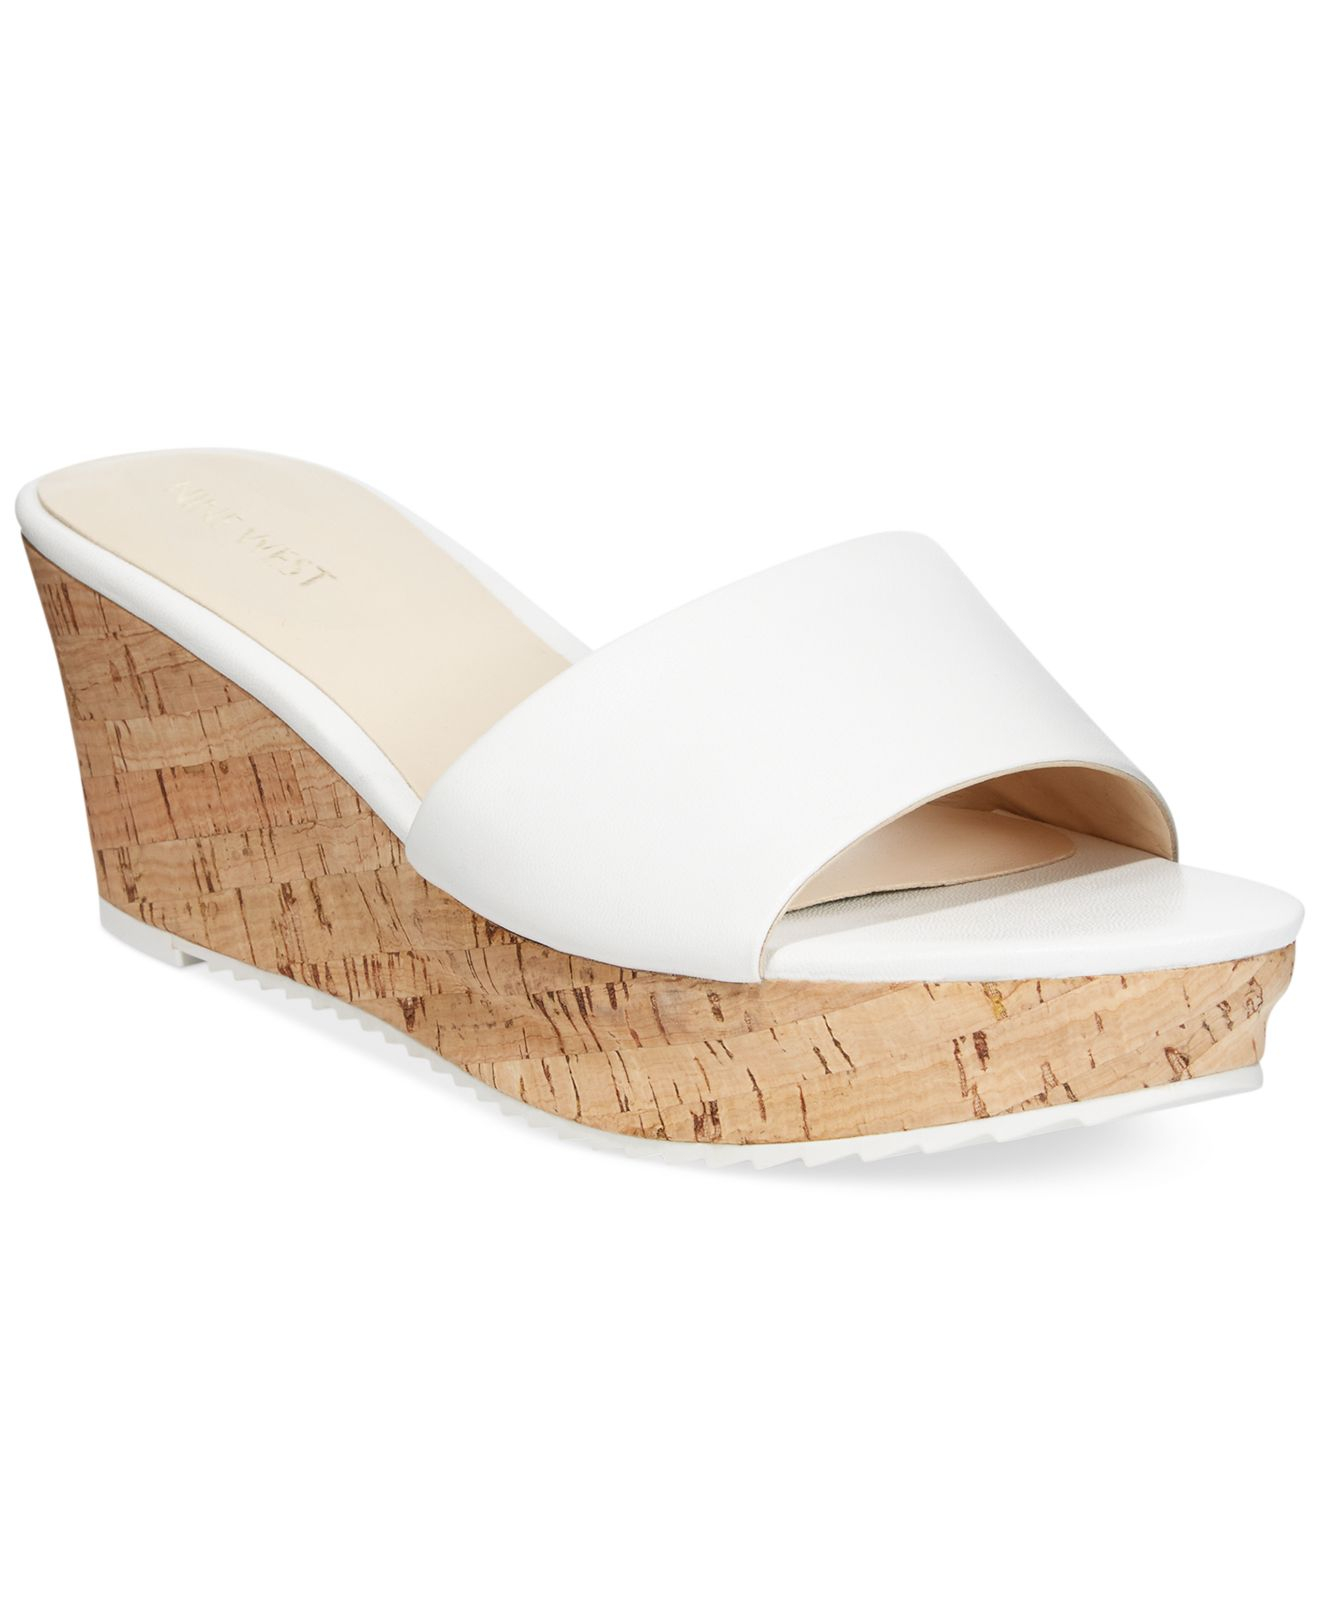 da0aea6a468 Lyst - Nine West Confetty Platform Slide Sandals in White